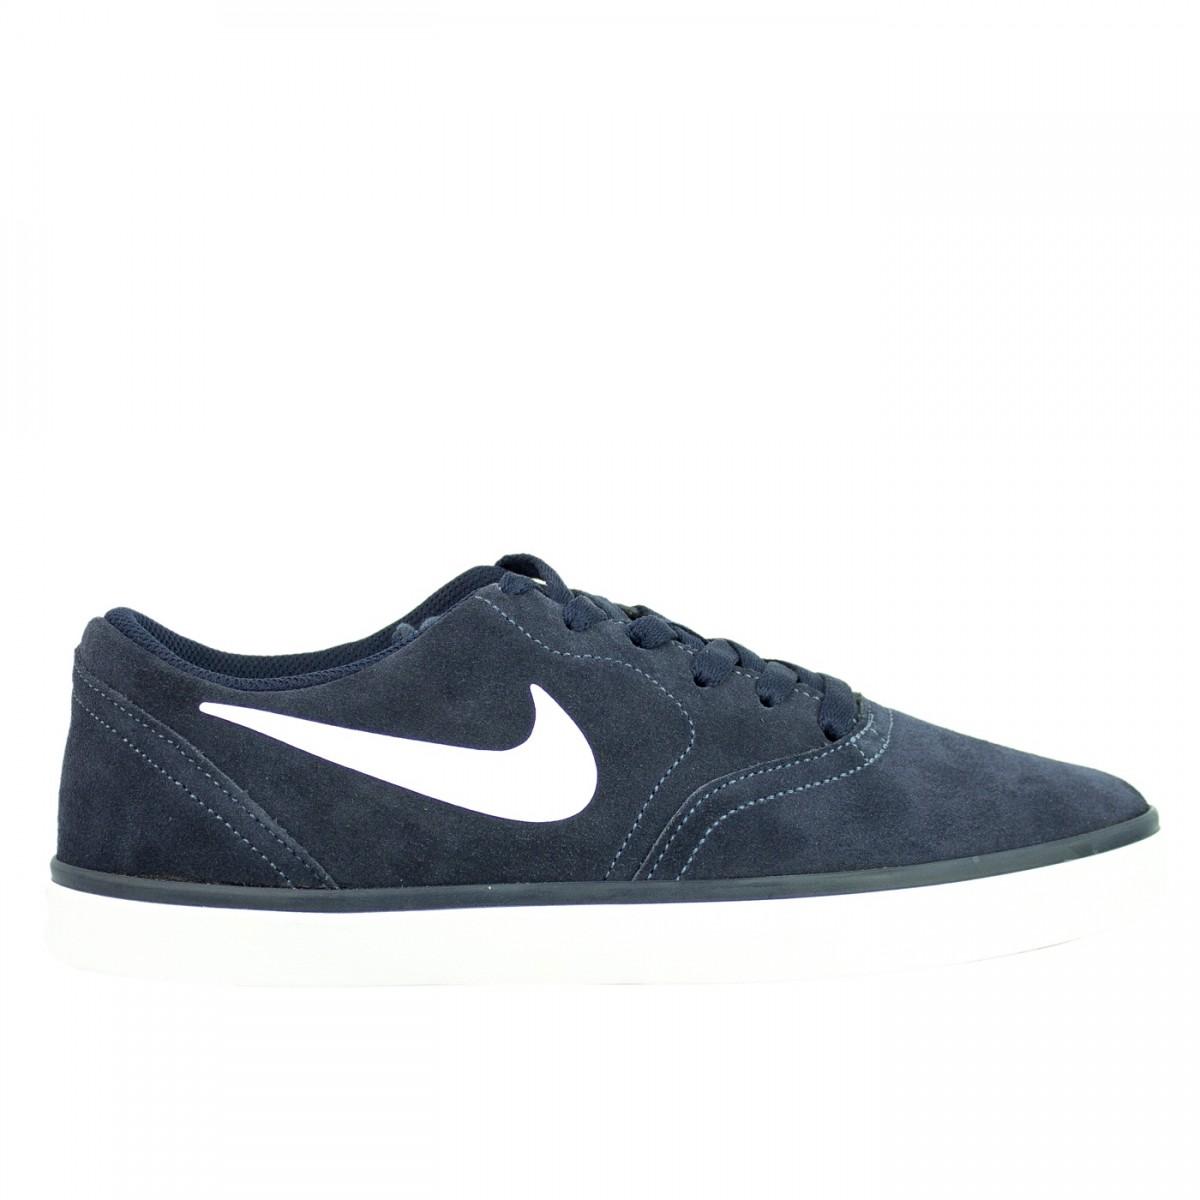 Bizz Store Tênis Masculino Nike SB Check Couro Nobuck Nobuck Nobuck Marinho 33c377